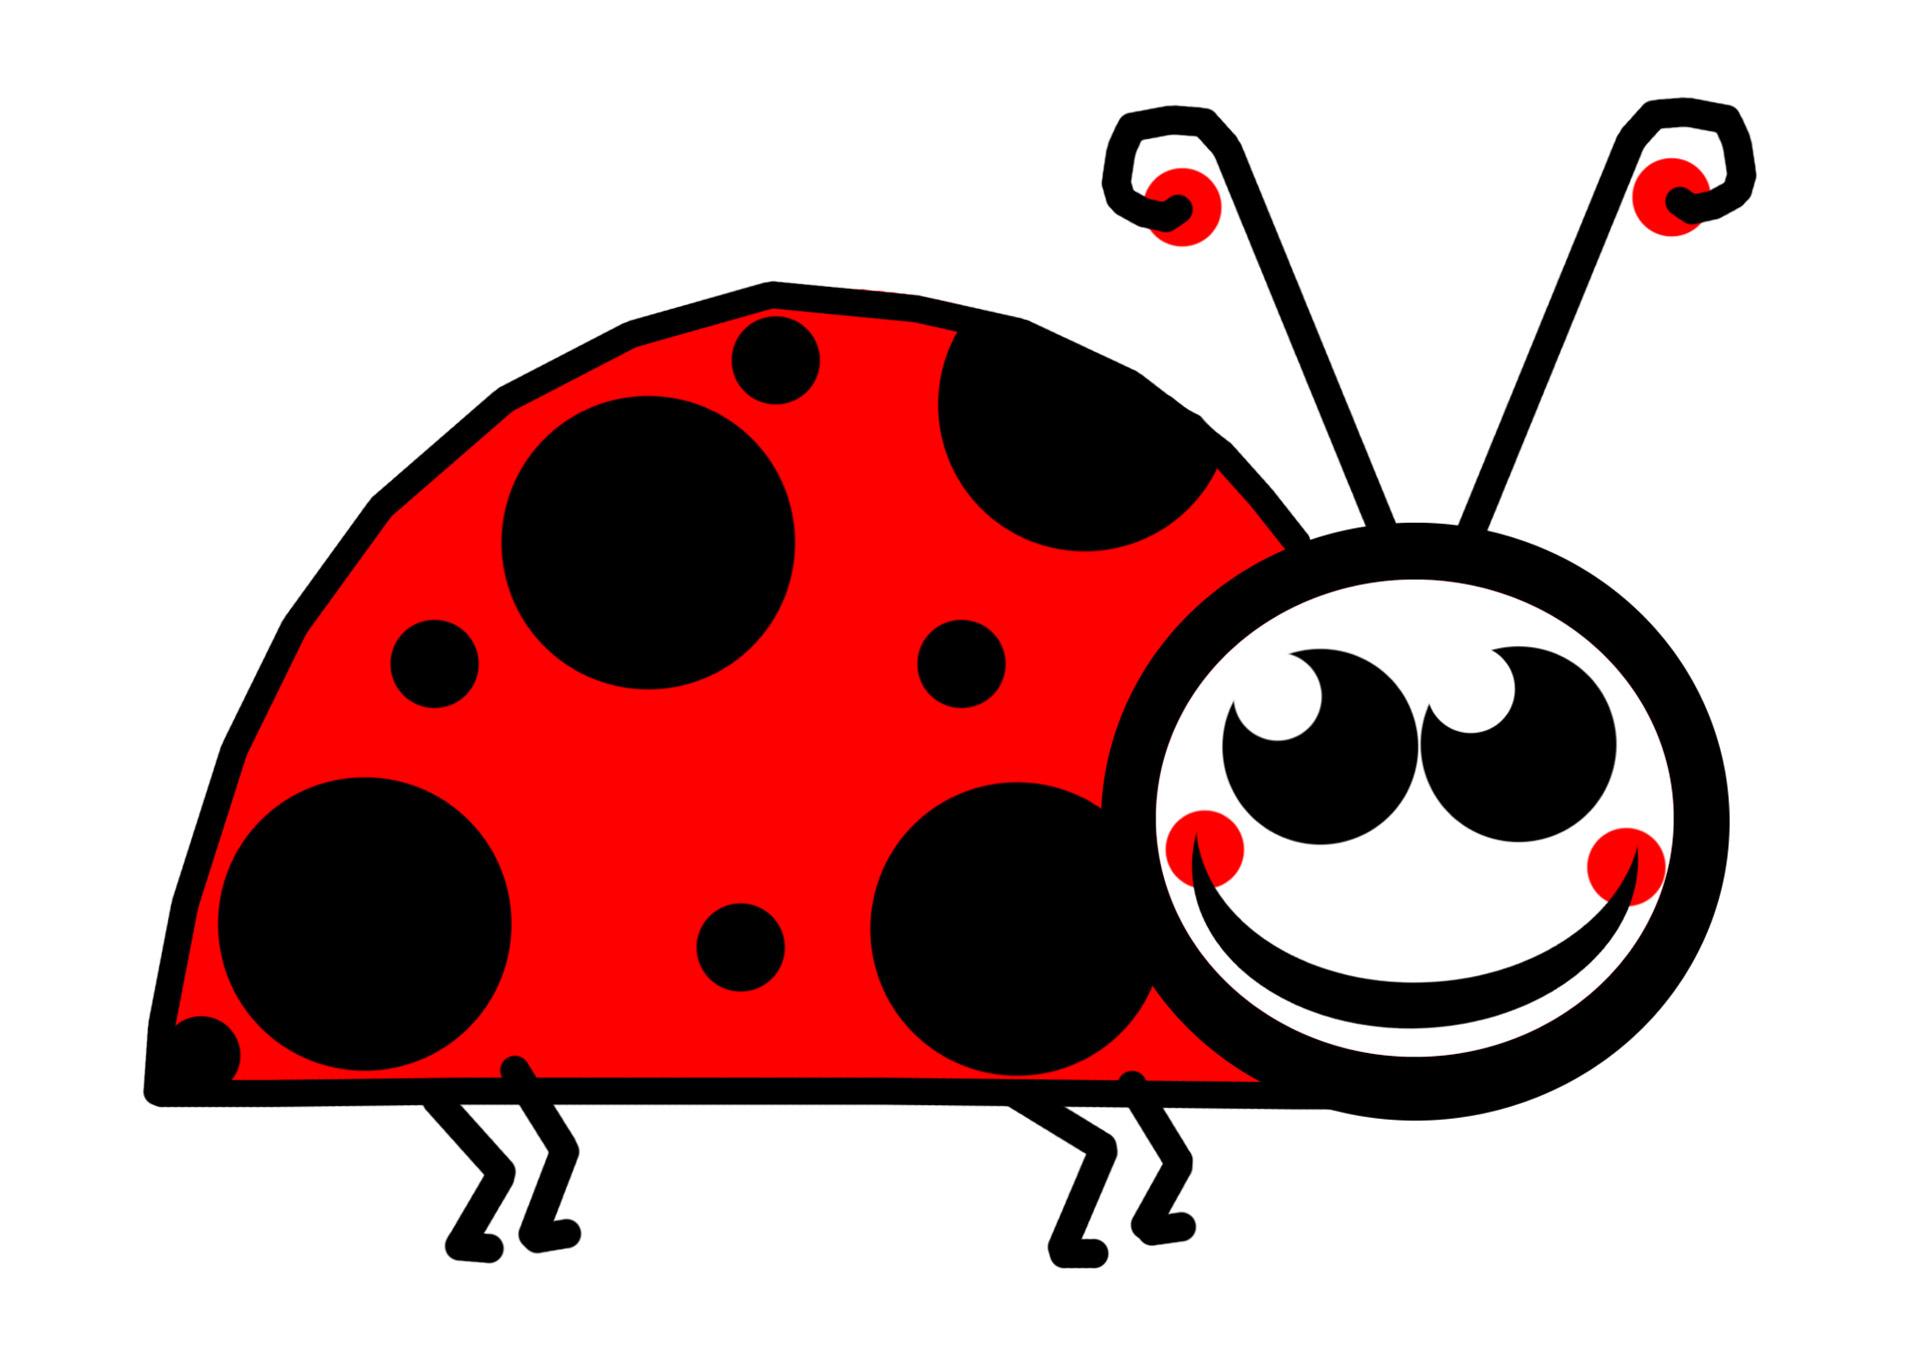 Bug Clipart & Bug Clip Art Images.